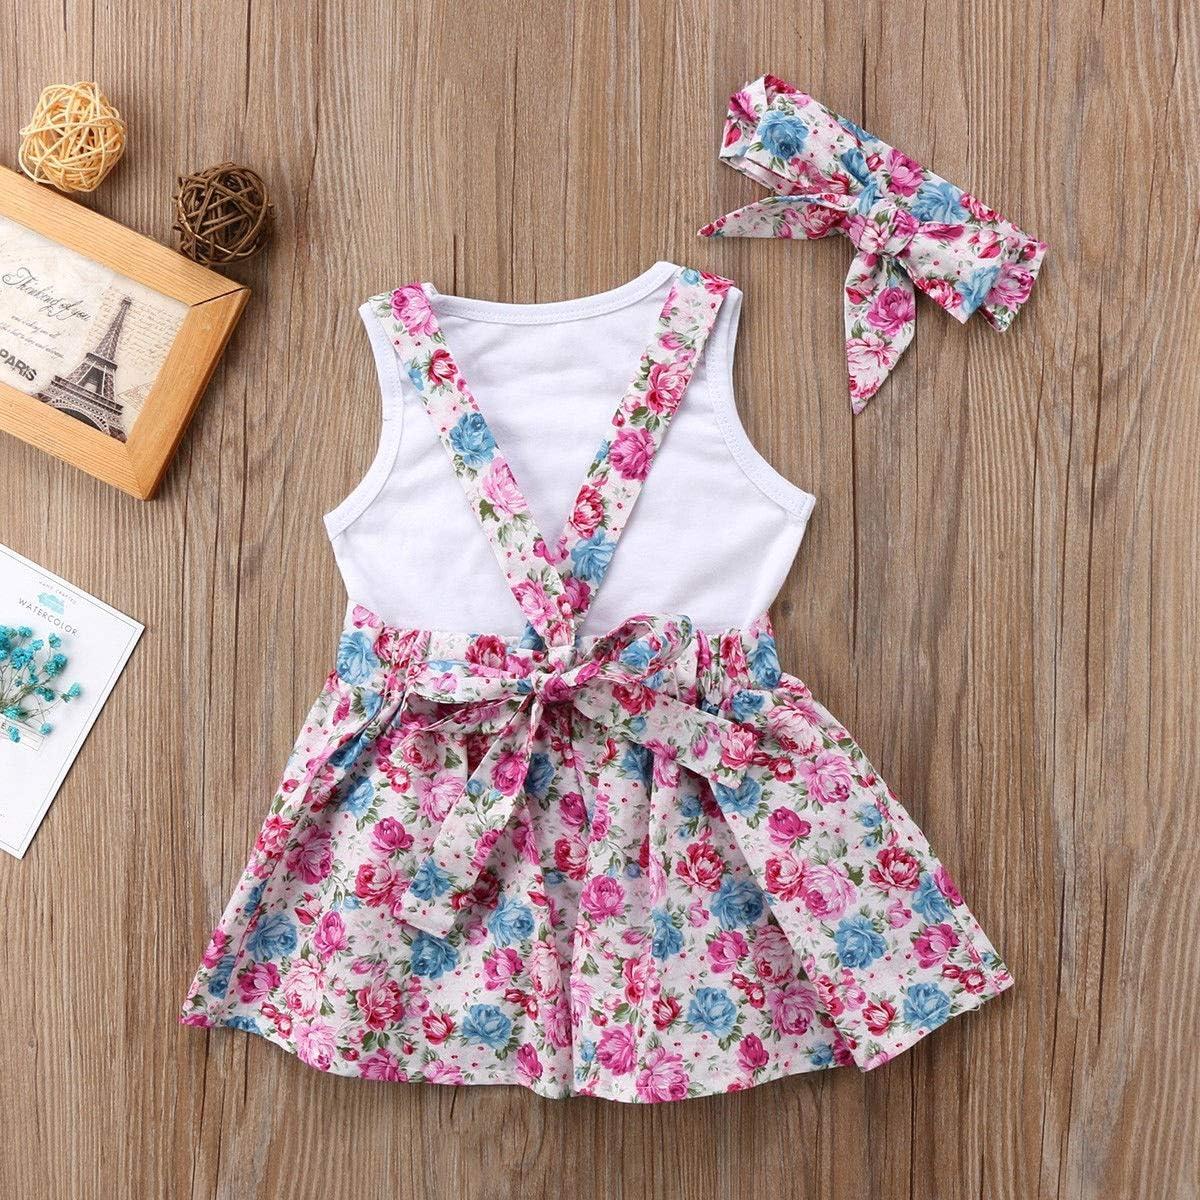 Puseky 3 st/ücke baby m/ädchen schwester passenden herz weste stirnband Color : White+Pink, Size : Big Sister-2Y-3Y floral strapsrock sommer outfits